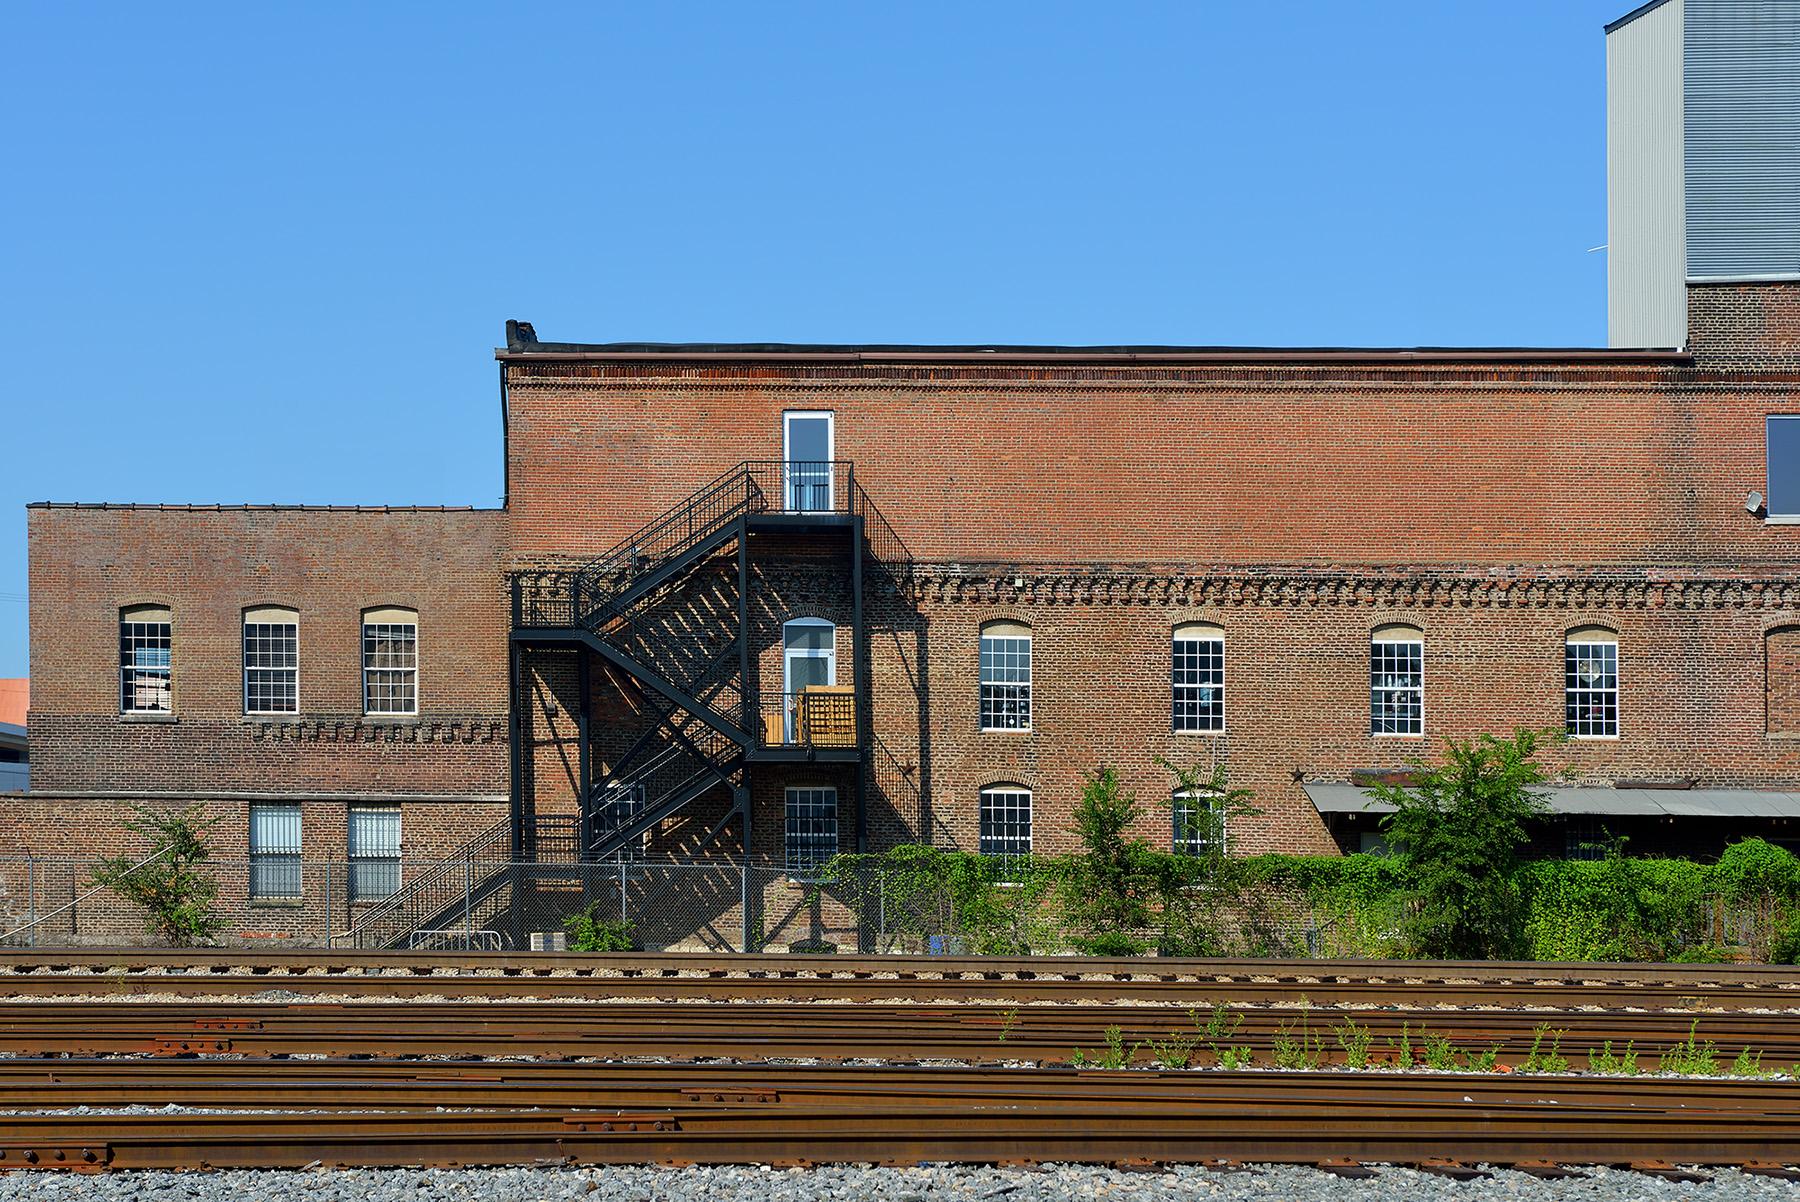 Nashville Railroad